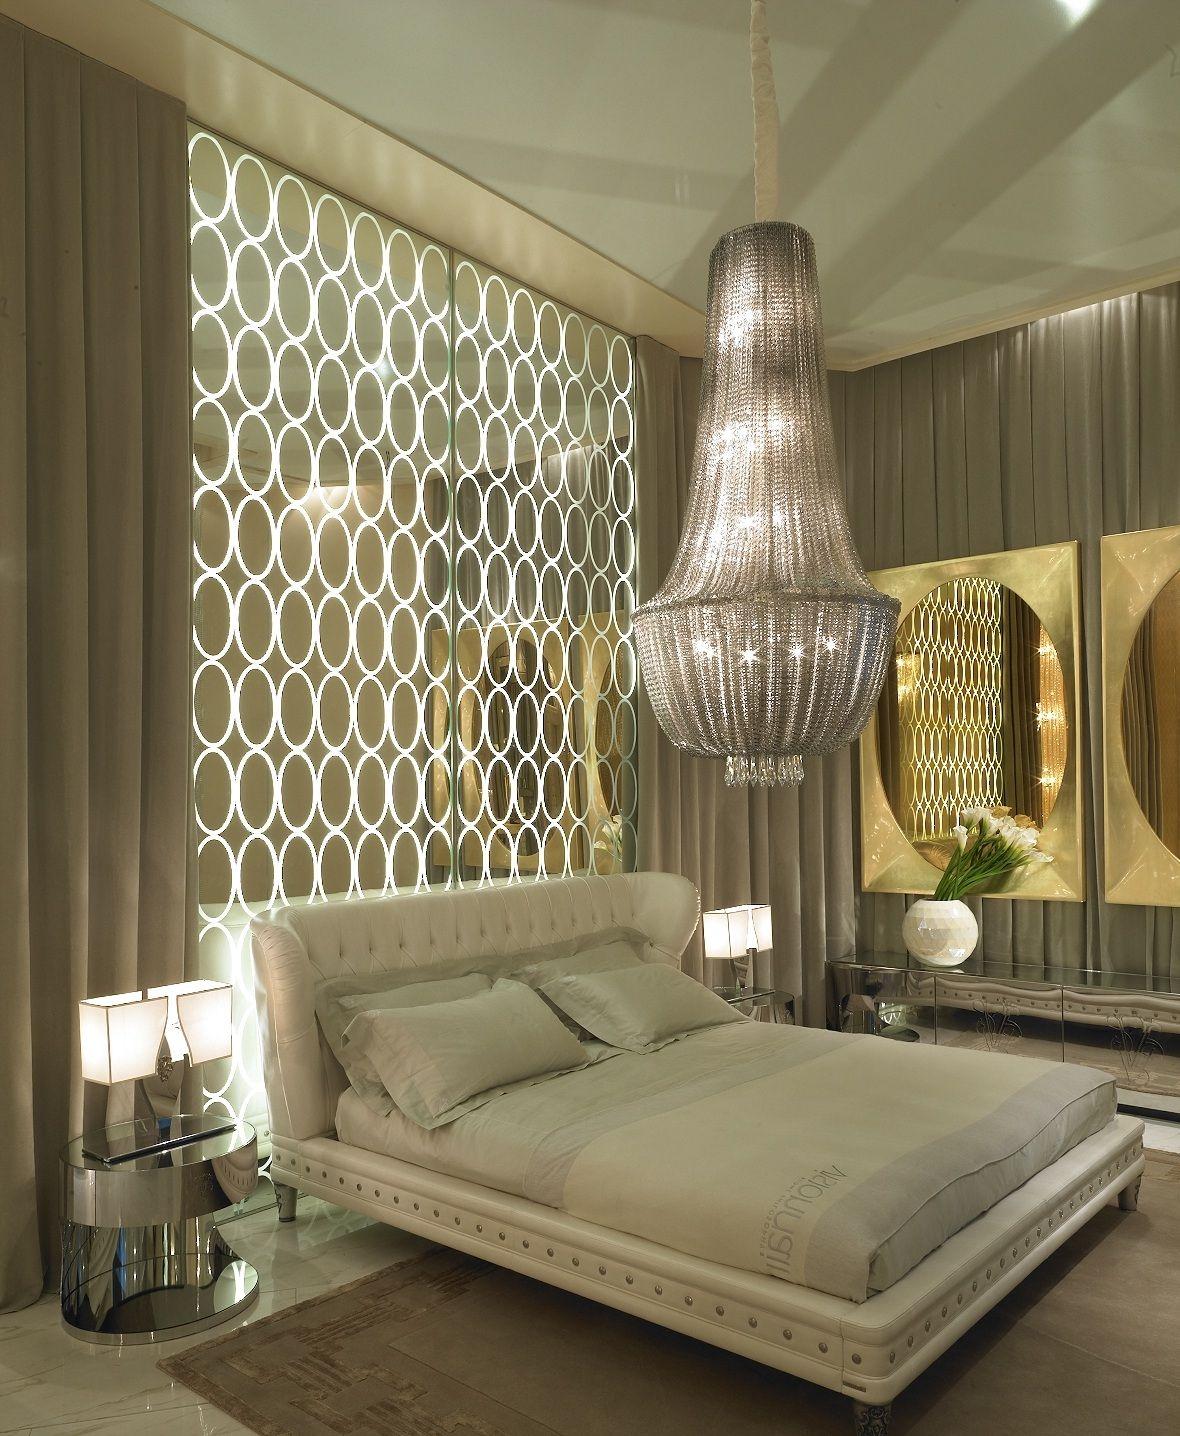 Luxe italian designer interiors sharing home decor inspirations  also rh pinterest